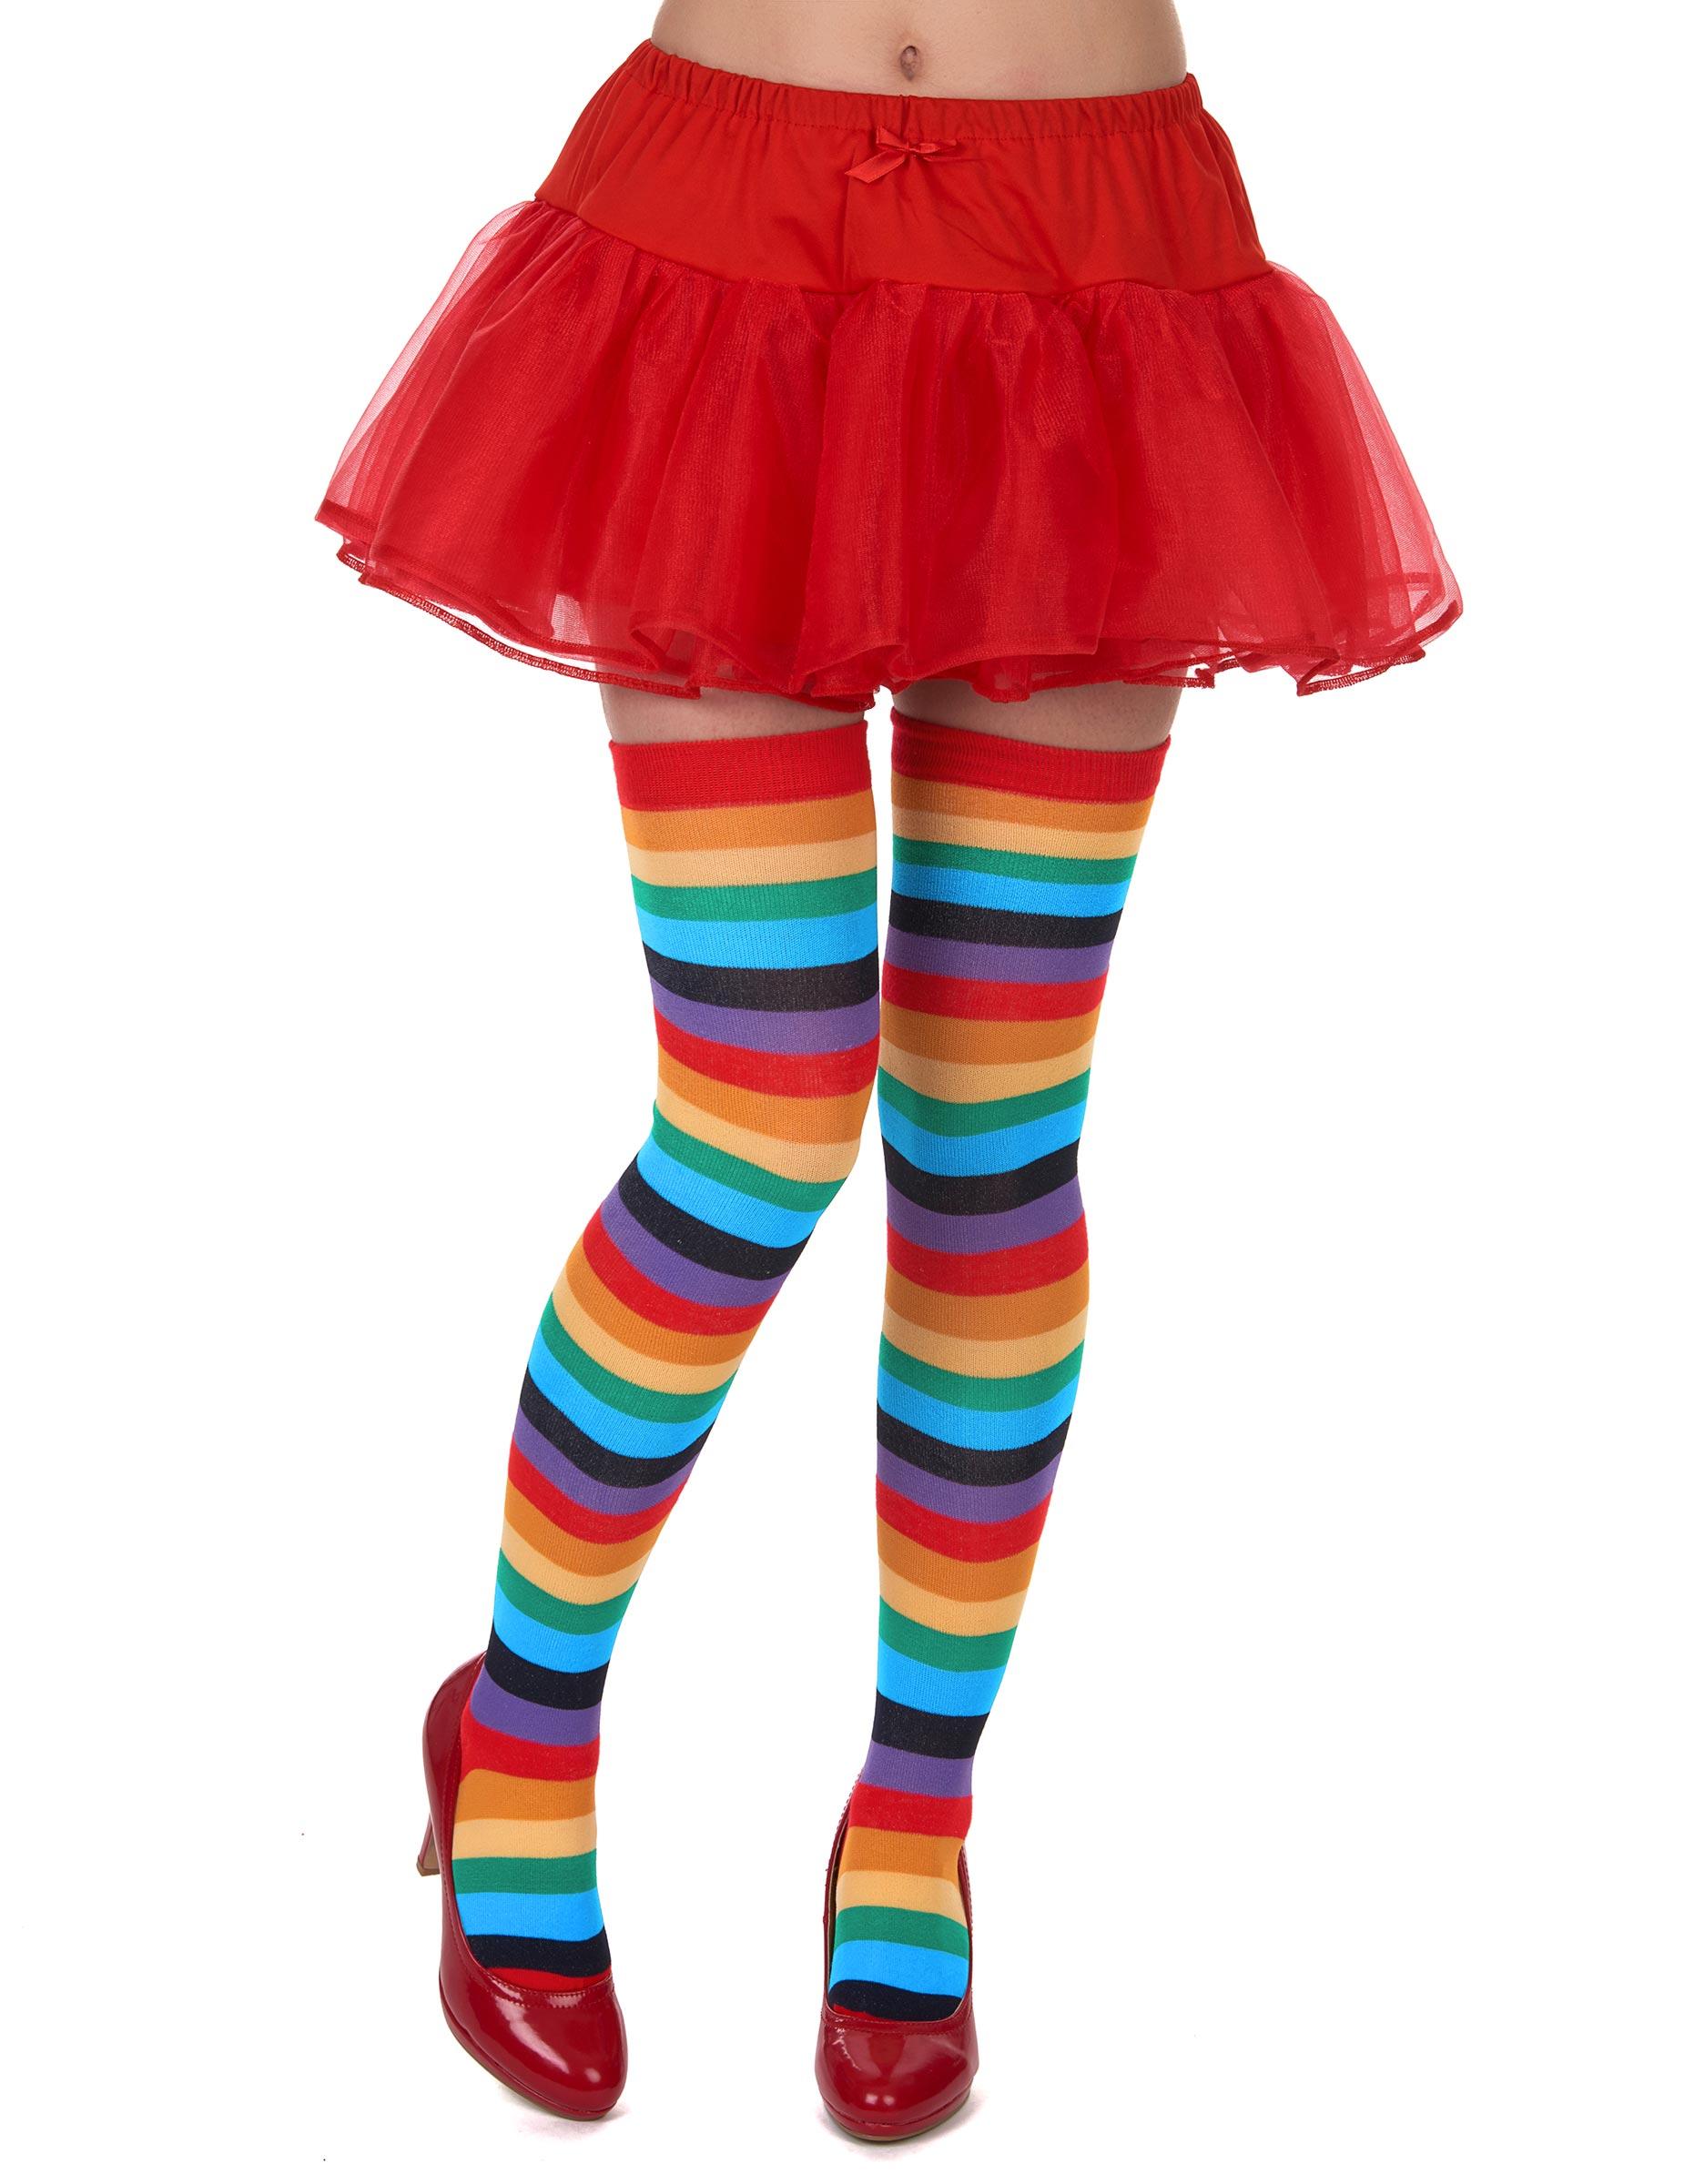 9edfb76680f5f Clown Damen Strümpfe Overknees bunt gestreift